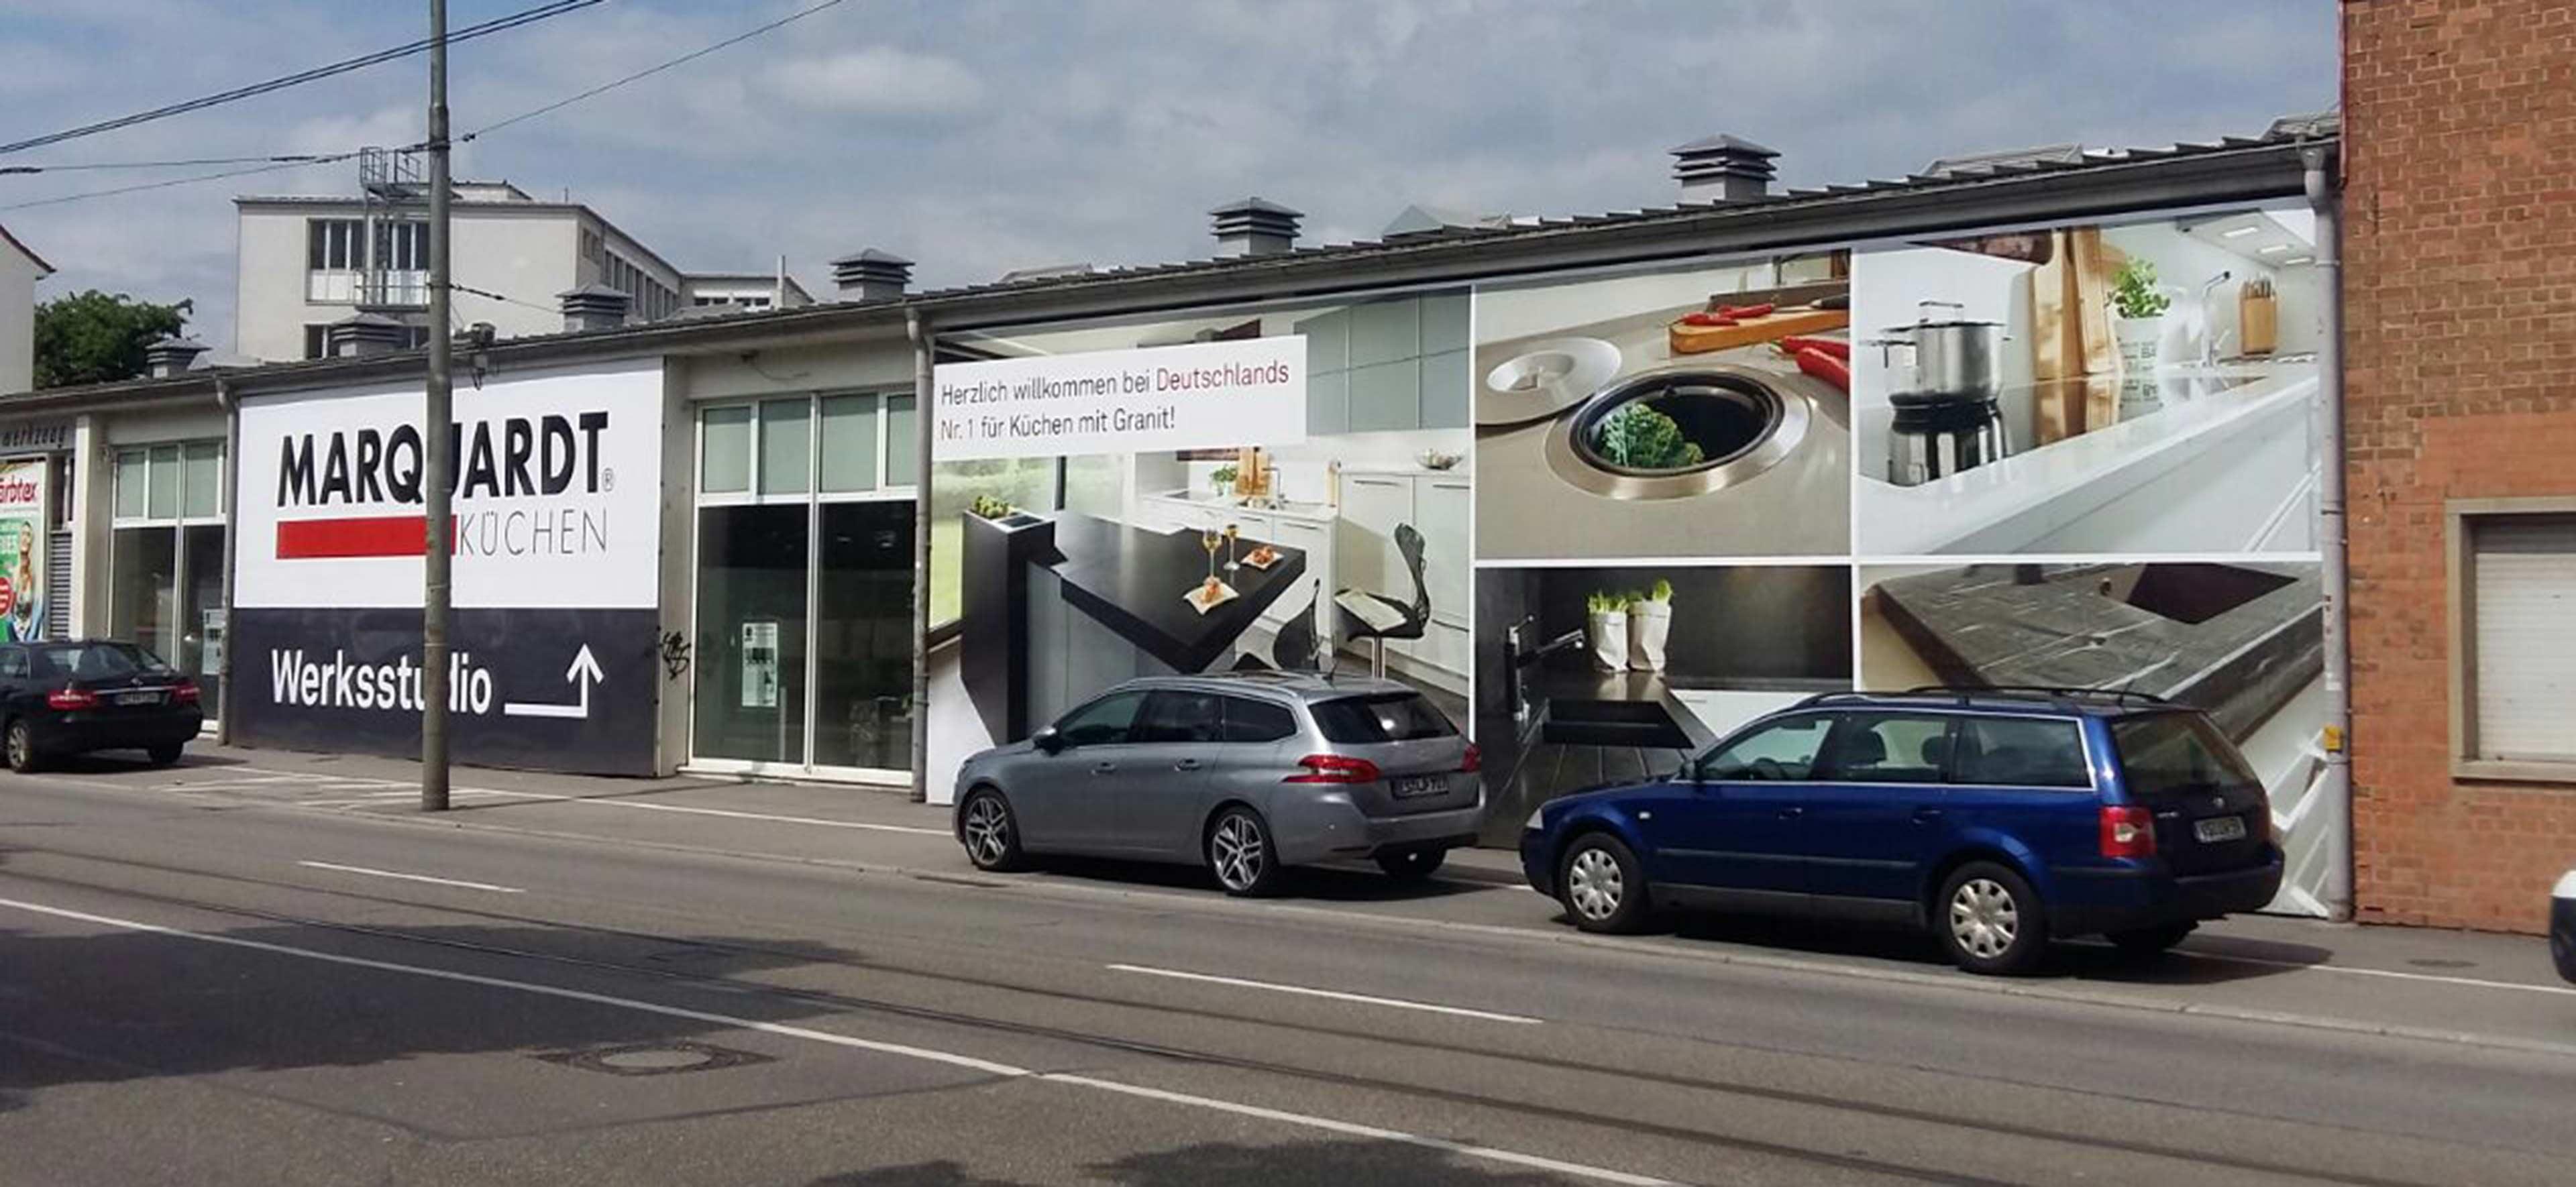 haus garten k chen in stuttgart infobel deutschland. Black Bedroom Furniture Sets. Home Design Ideas